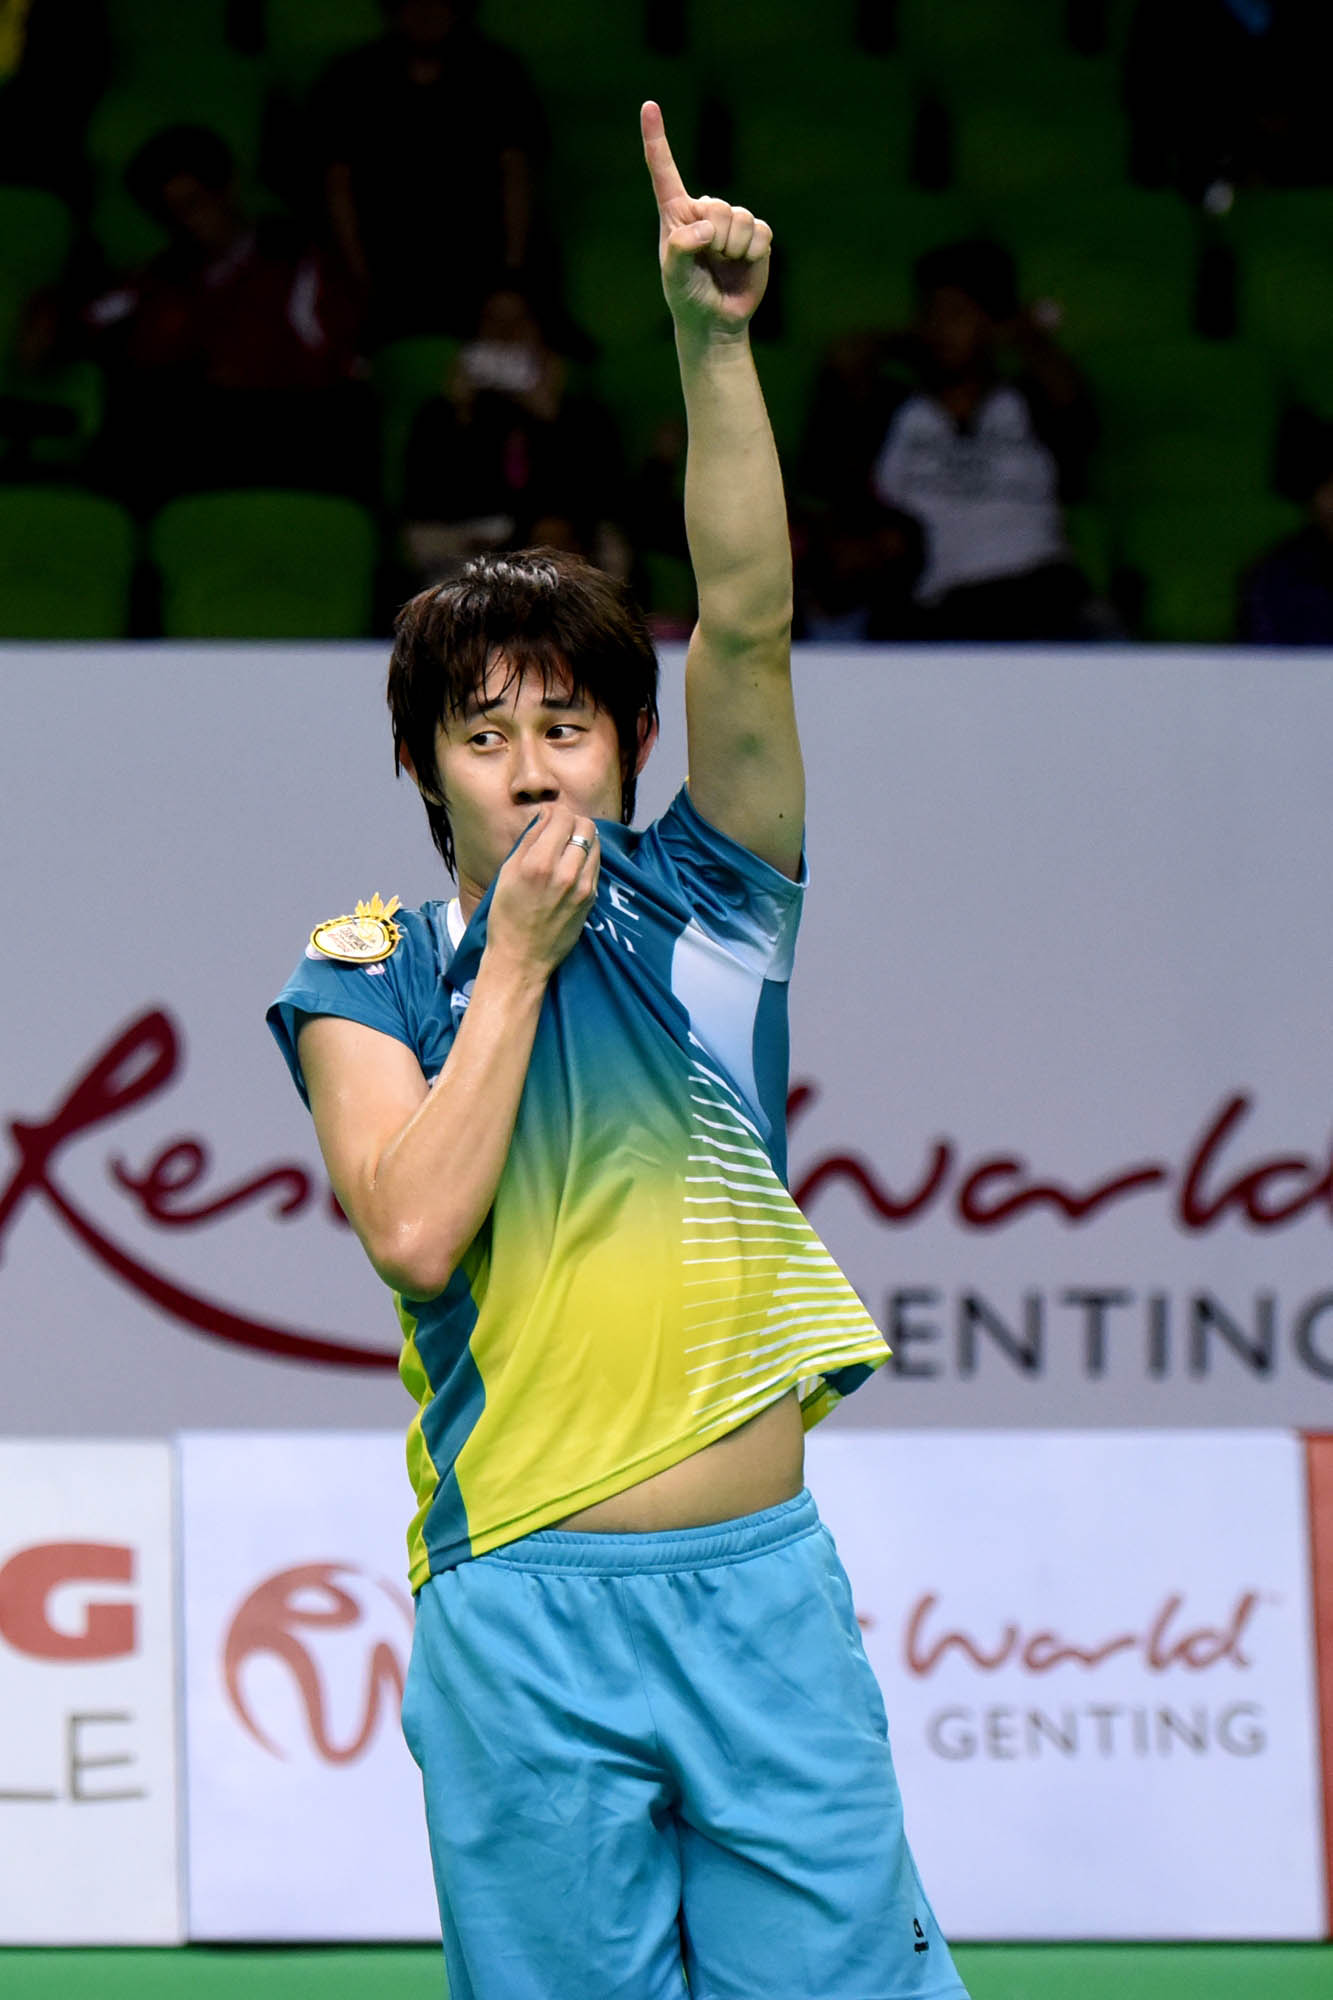 Resorts World Genting Champions Challenge - Muar City Badminton Club - Mens Single - Tan Chun Seang. Photo Credit - www.1titan.com